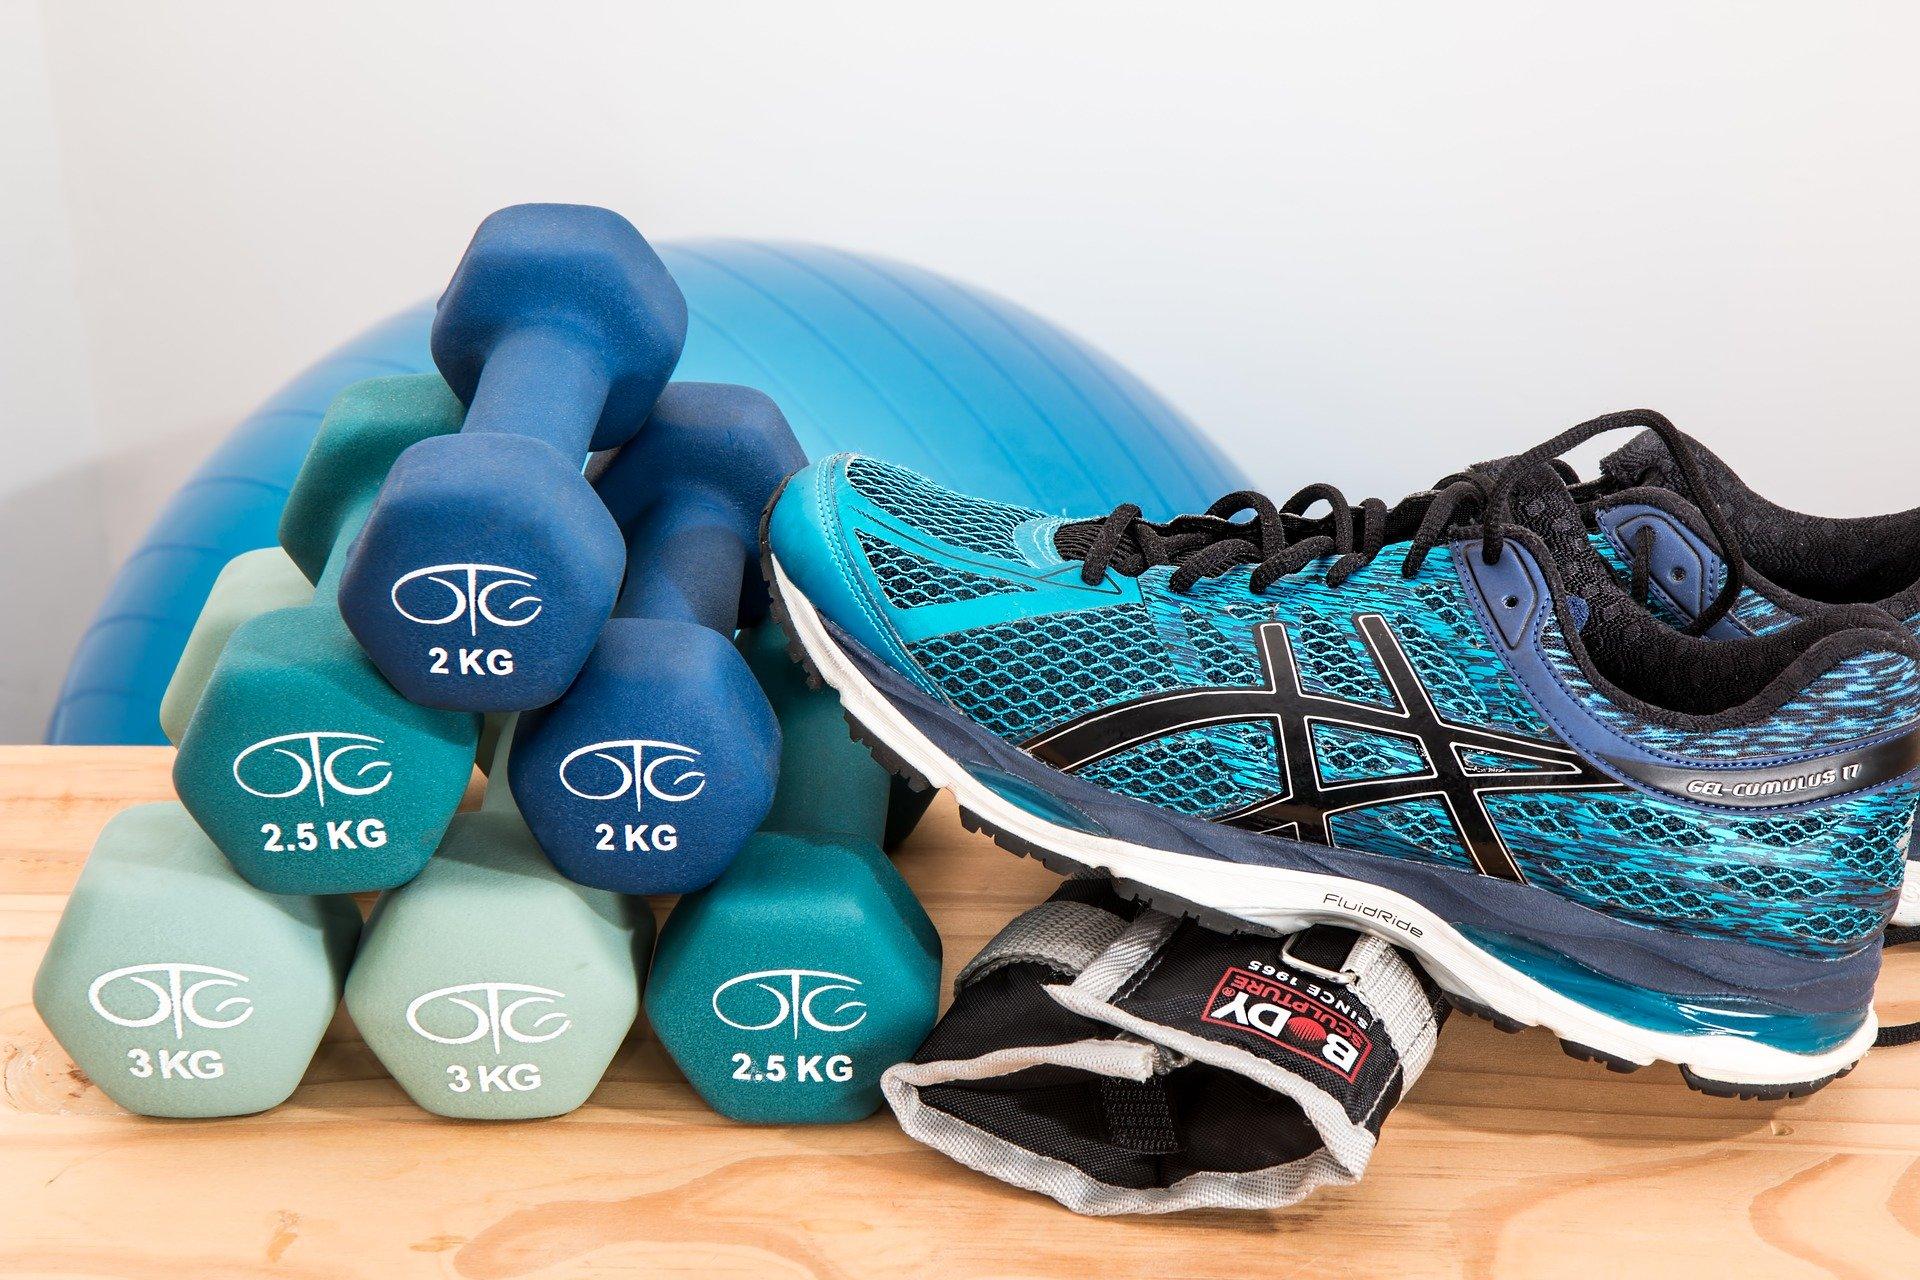 Climber Fitnessgerät